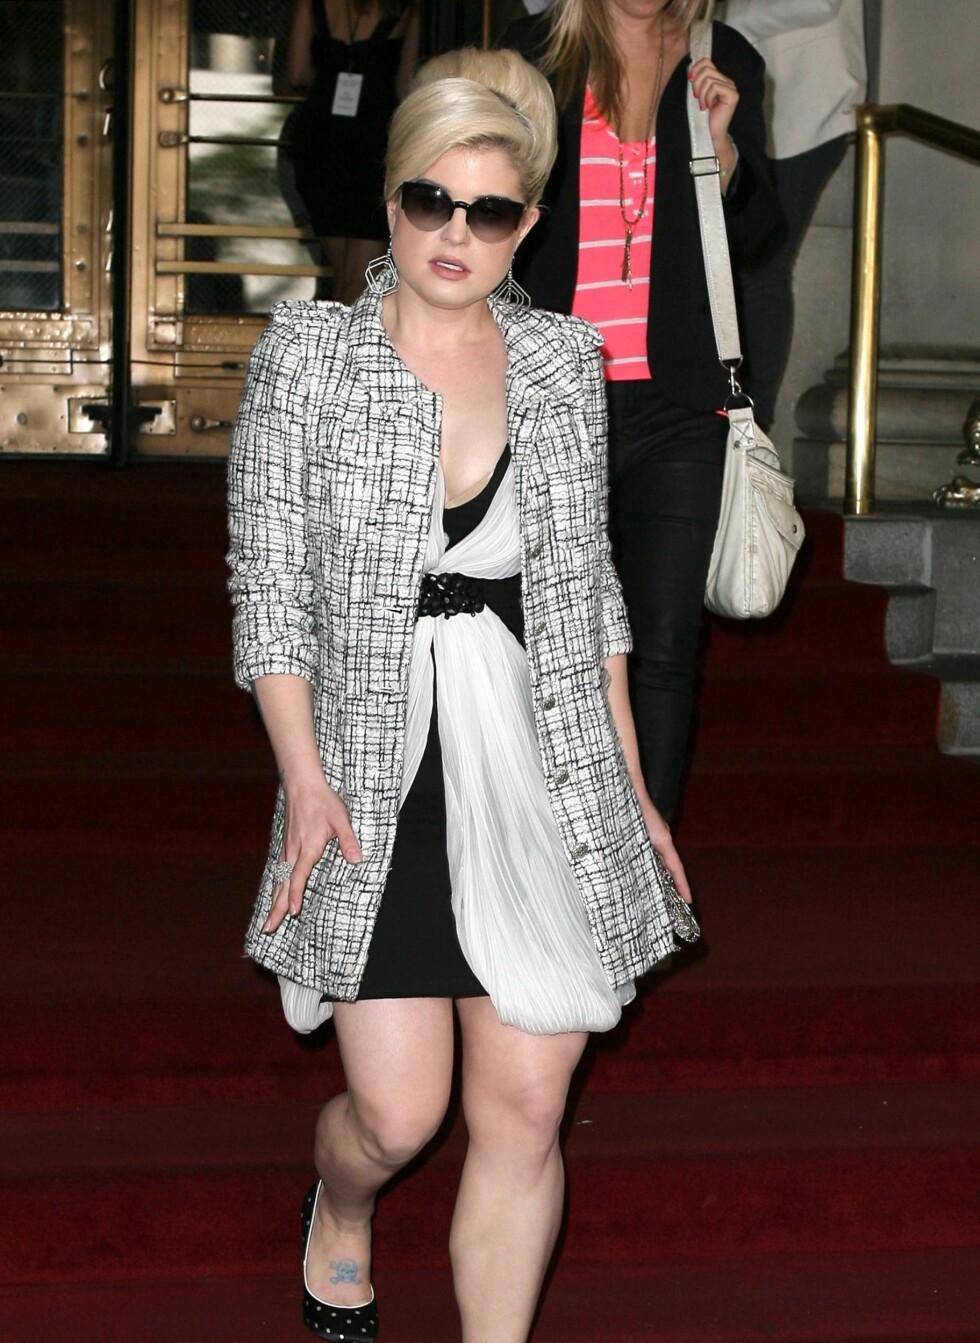 Kelly Osbourne på motevisning i New York. Foto: All Over Press